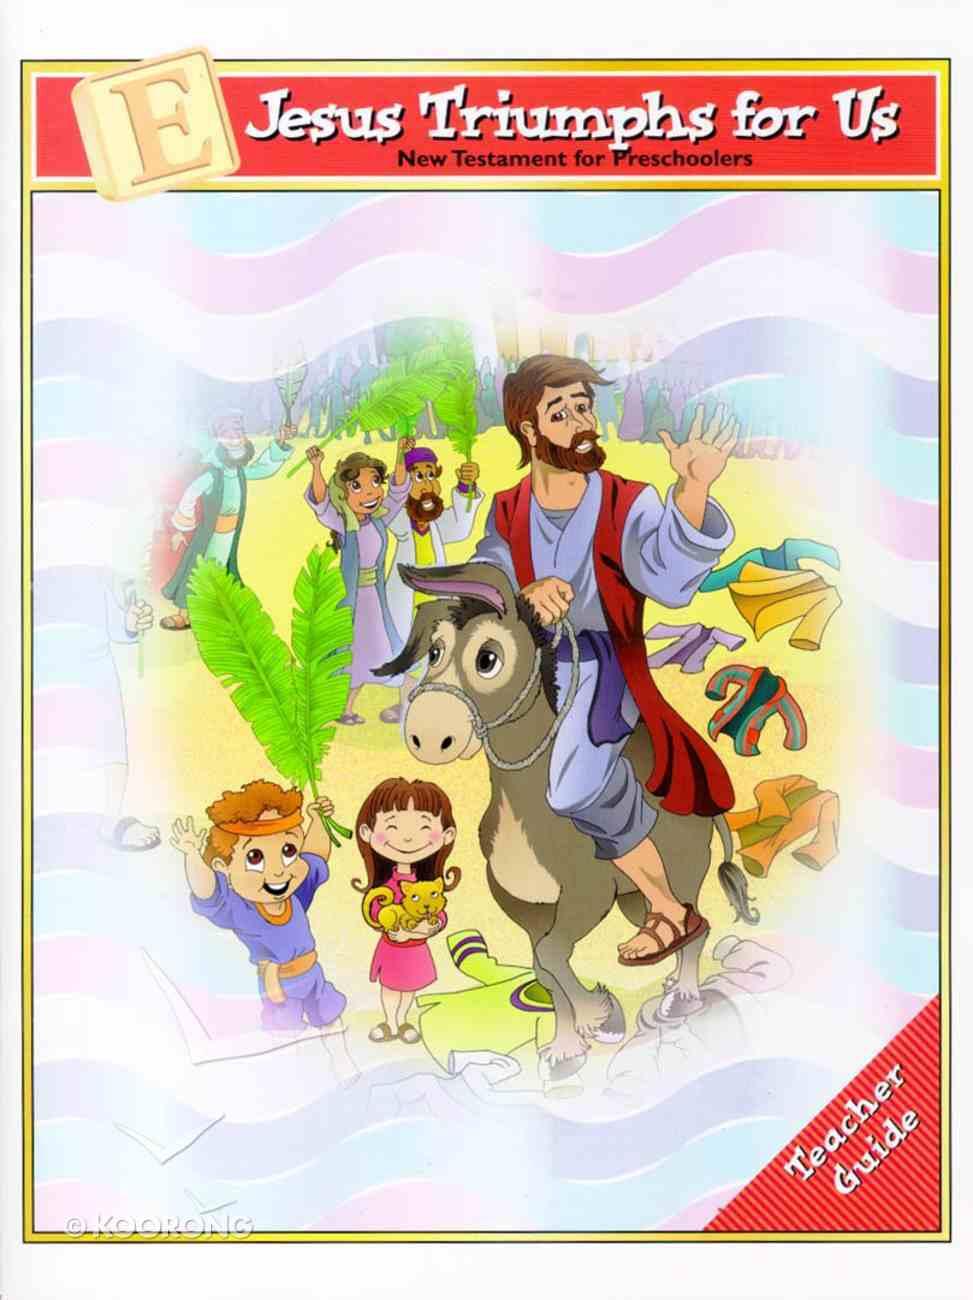 Dlc Preschool: NT, Unit E Ages 2-5 (Teacher) (Discipleland Preschool, Ages 3-5 Series) Paperback